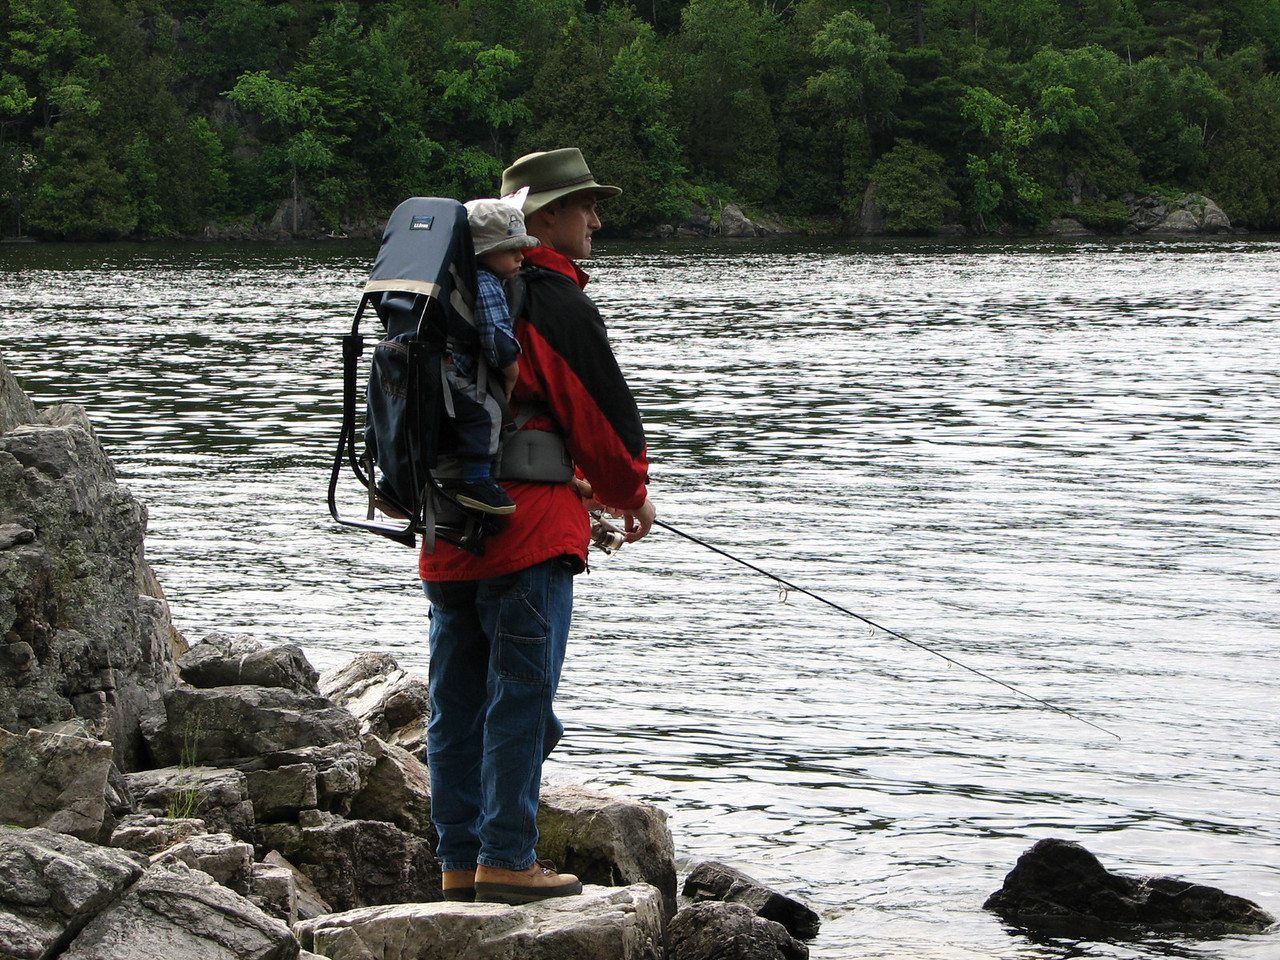 Hans and son, Austin enjoy a good fishing spot.